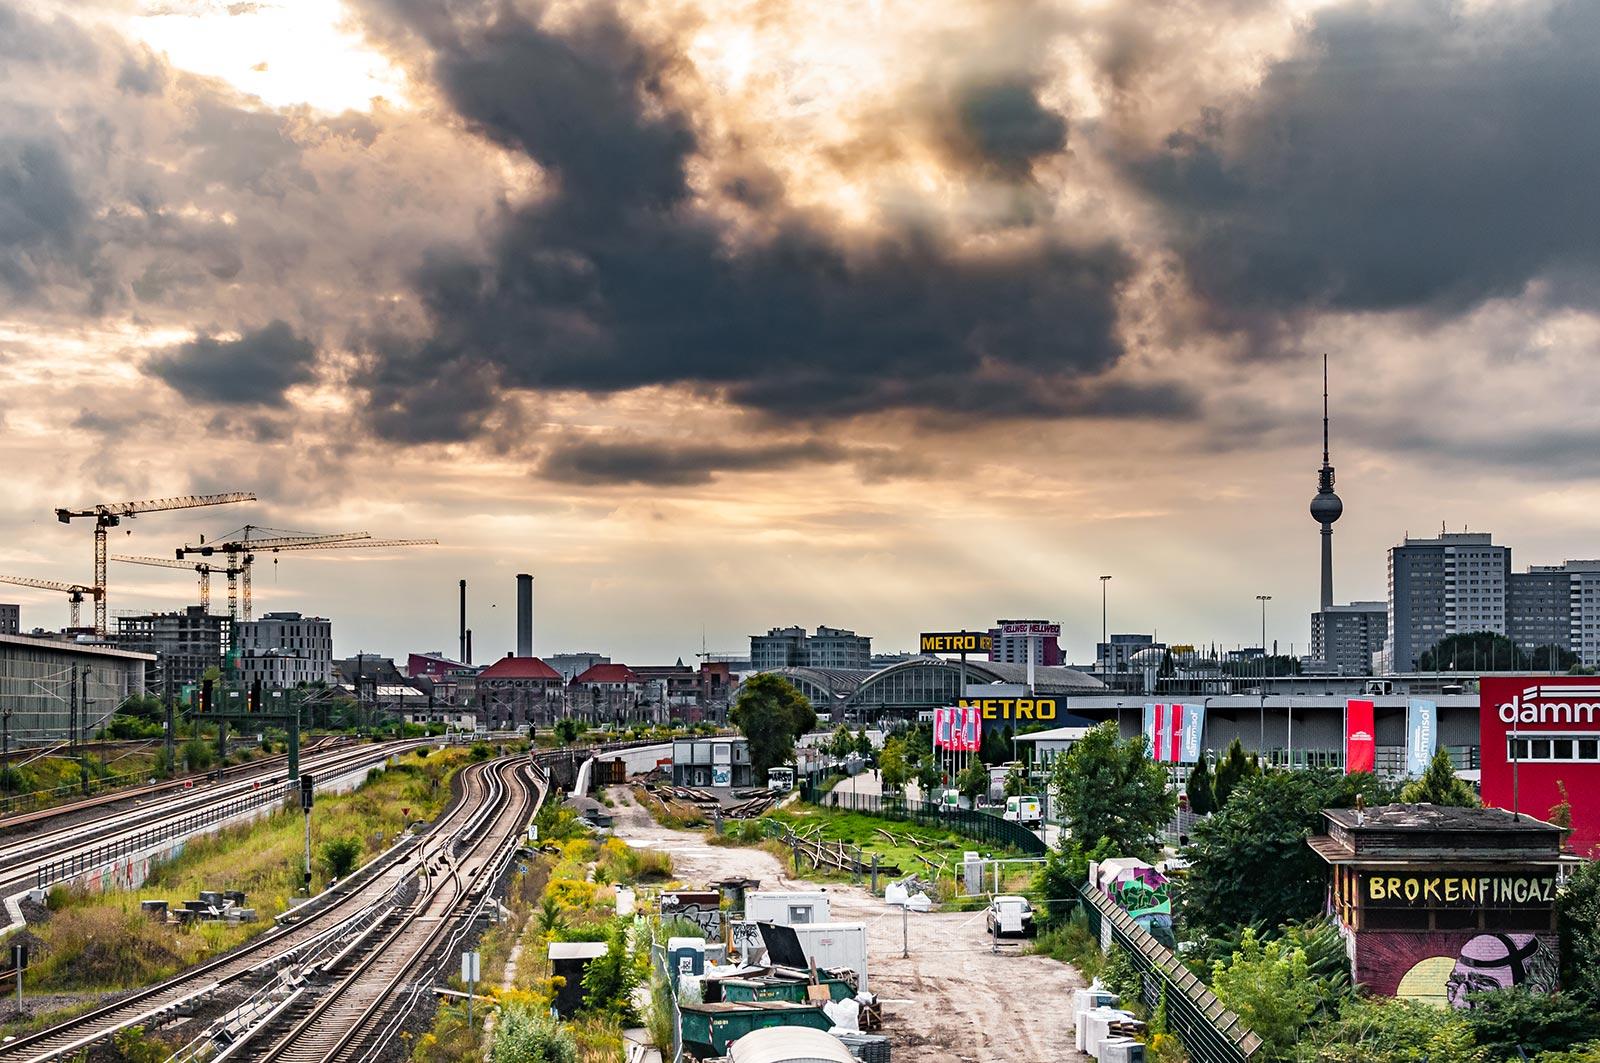 reisefuehrer-berlin